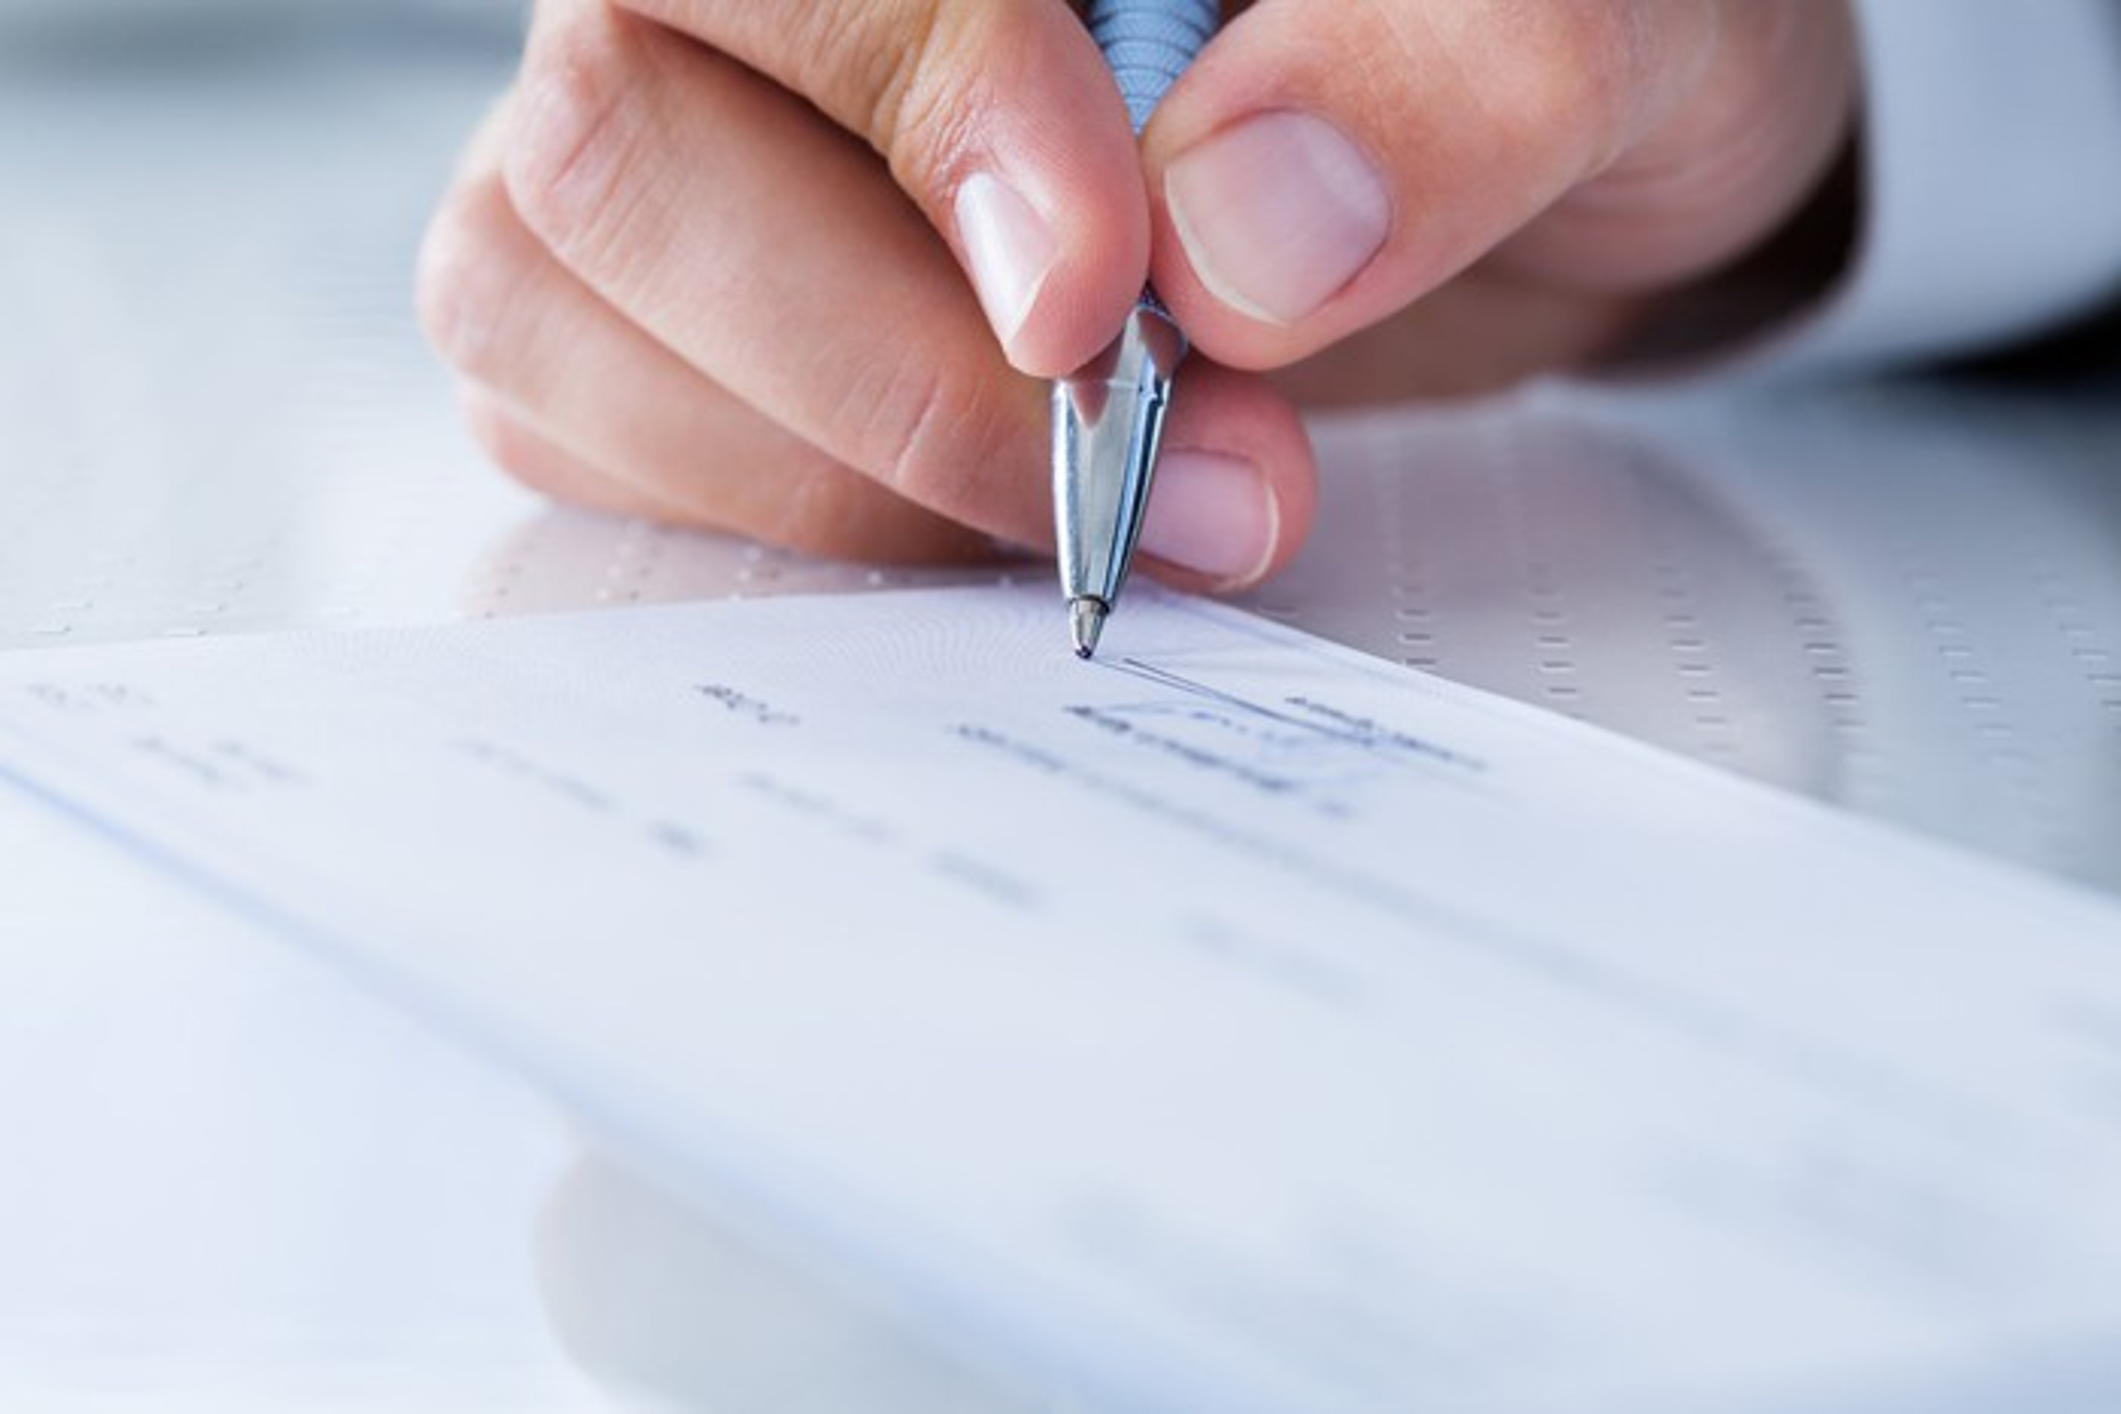 A man signs a check.